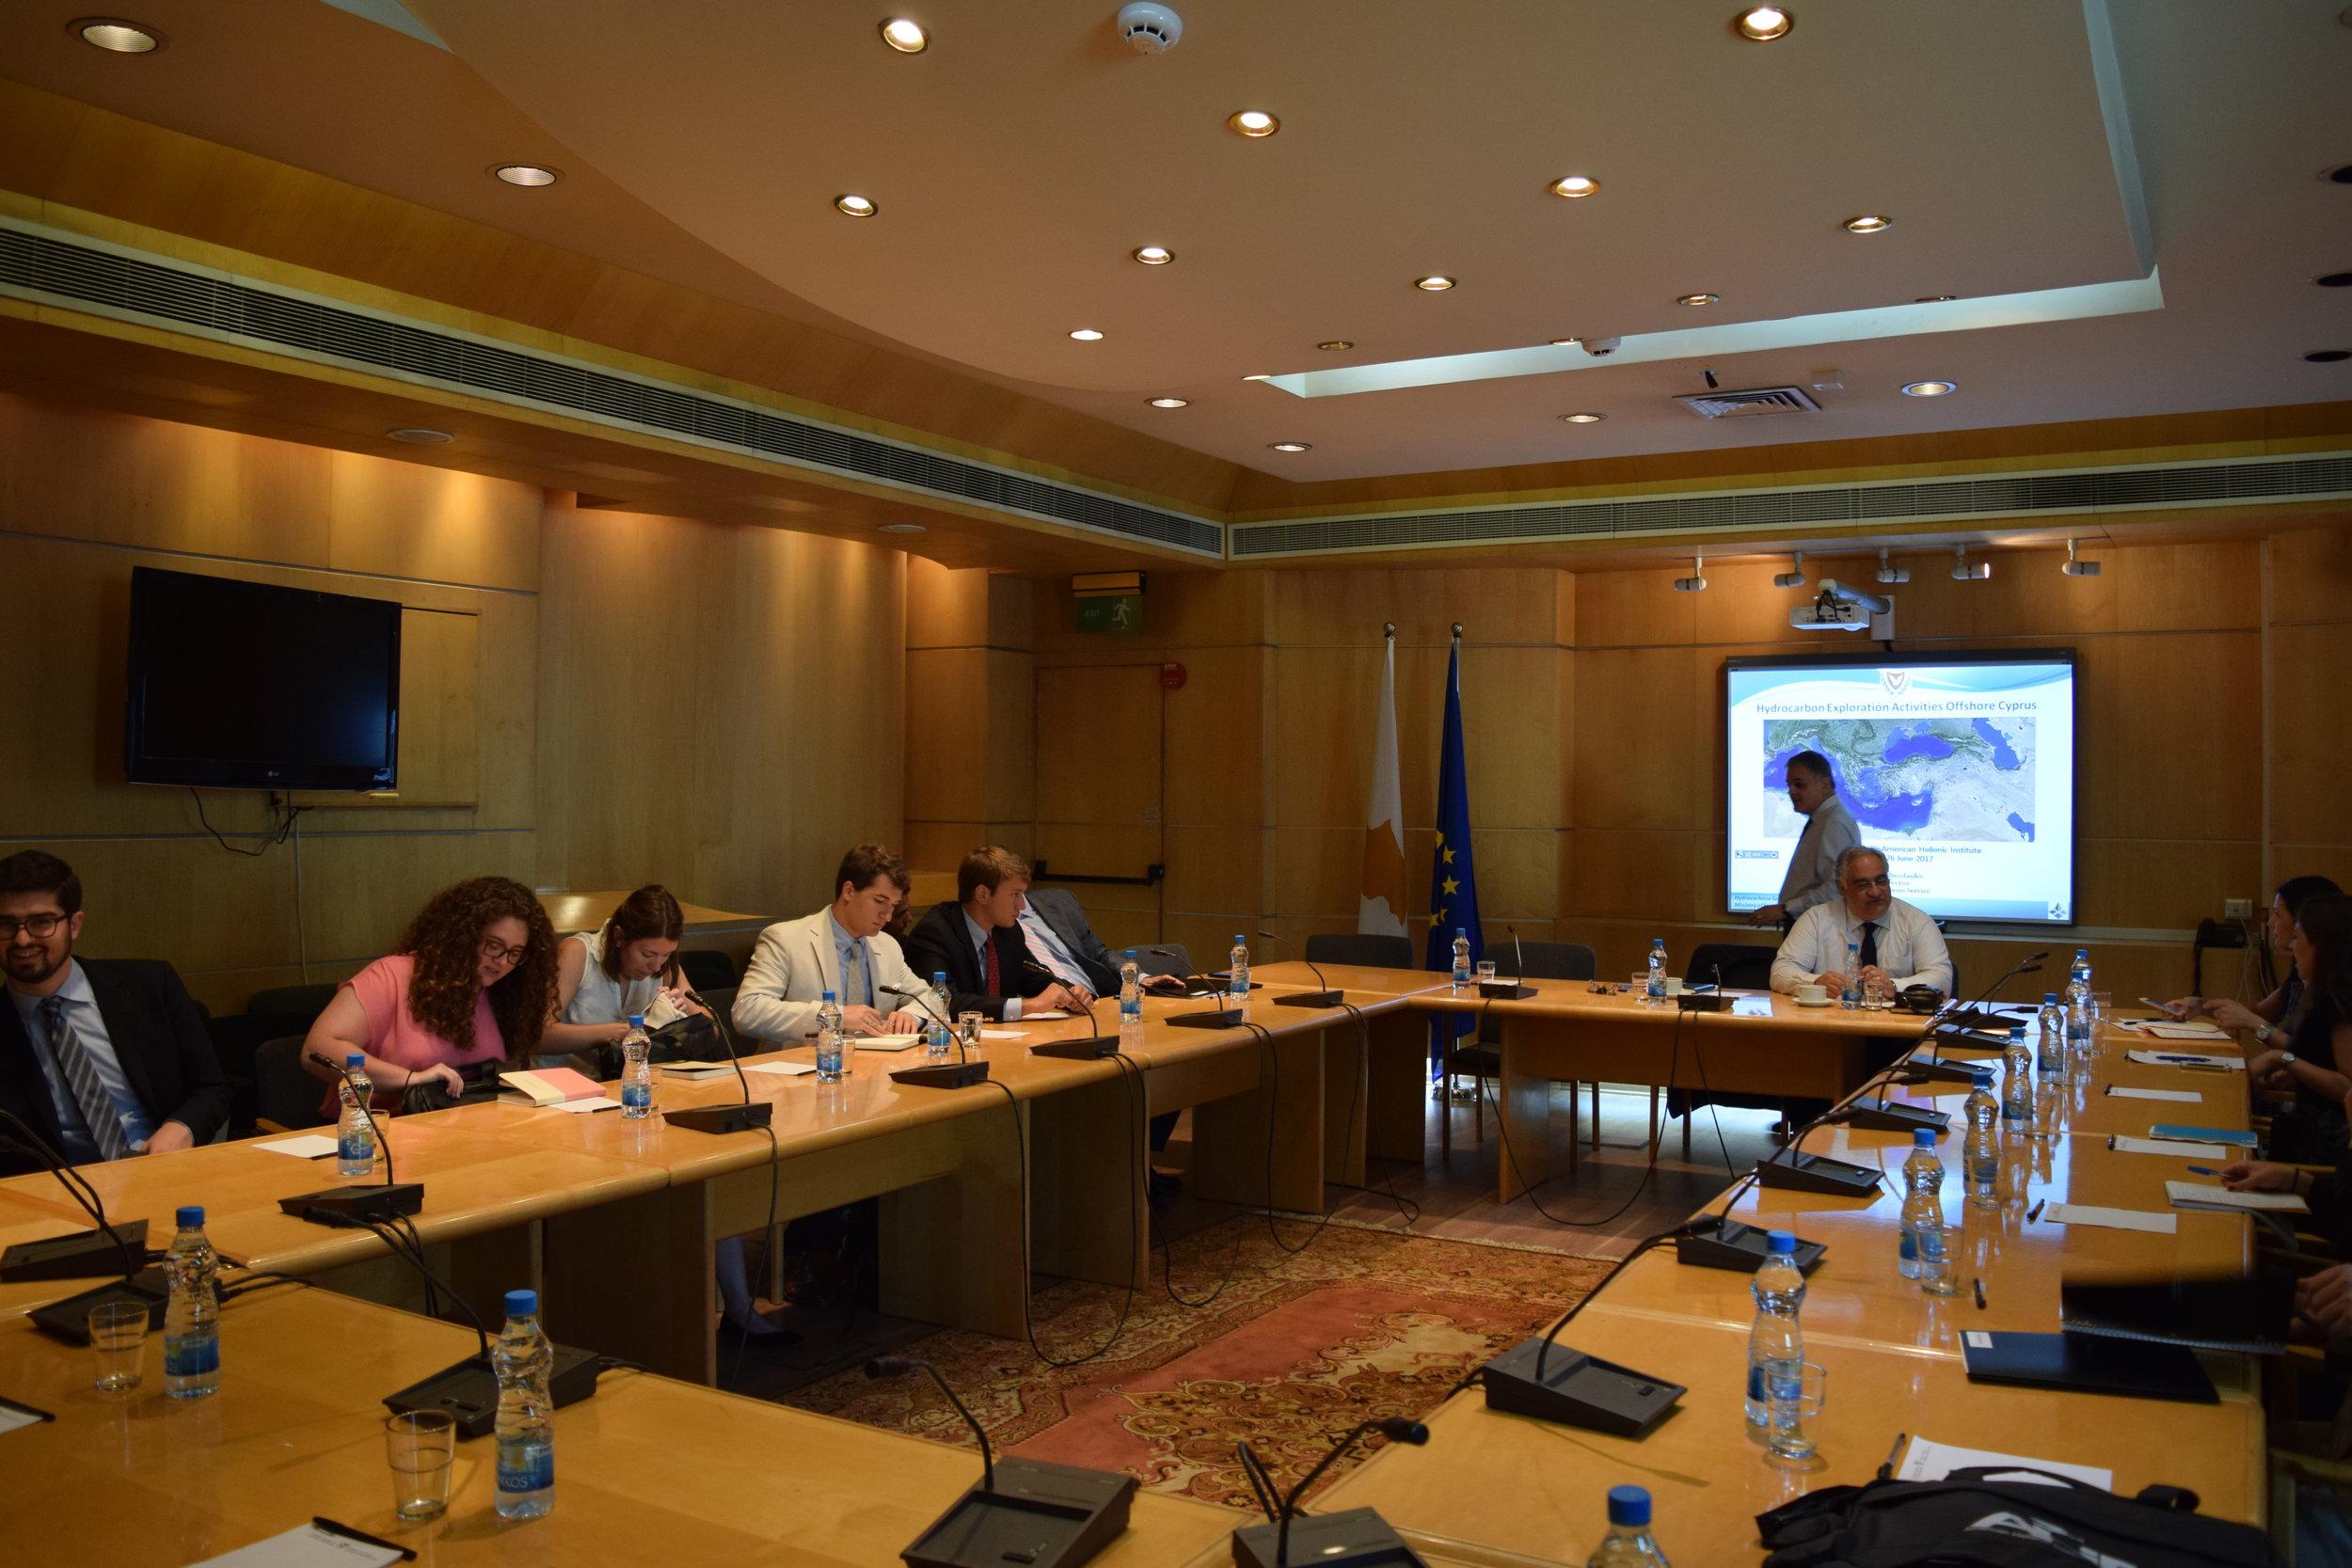 Energy briefing with Ambassador George Zodiatis, Dr. Stelios Nikolaides, and Evi Neophytou.